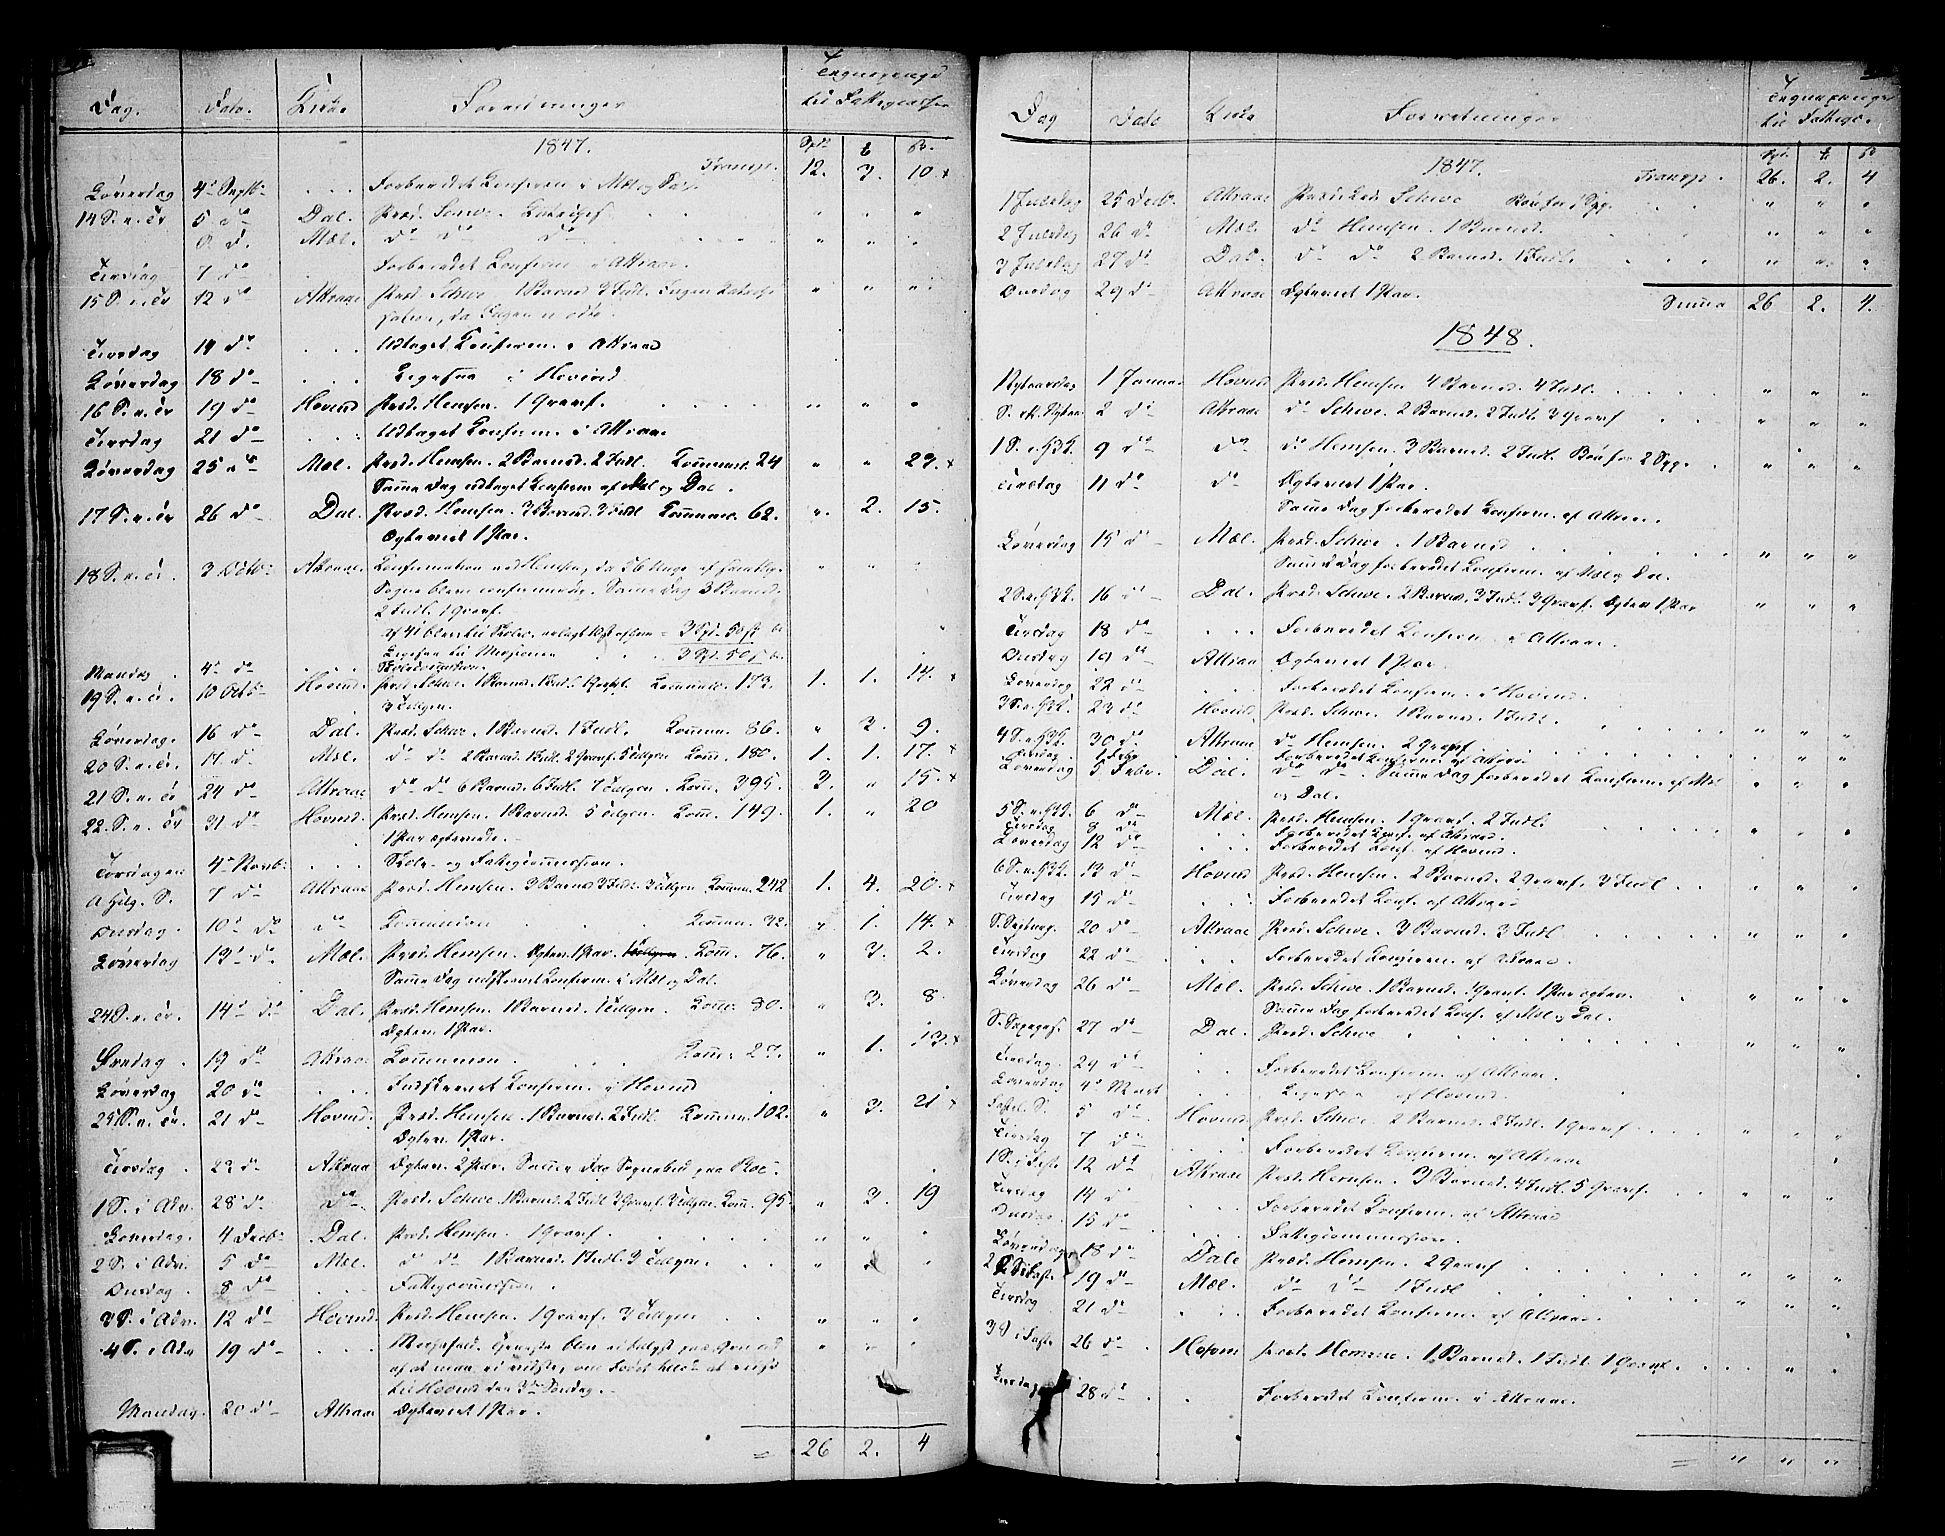 SAKO, Tinn kirkebøker, F/Fa/L0003: Ministerialbok nr. I 3, 1810-1814, s. 194-195